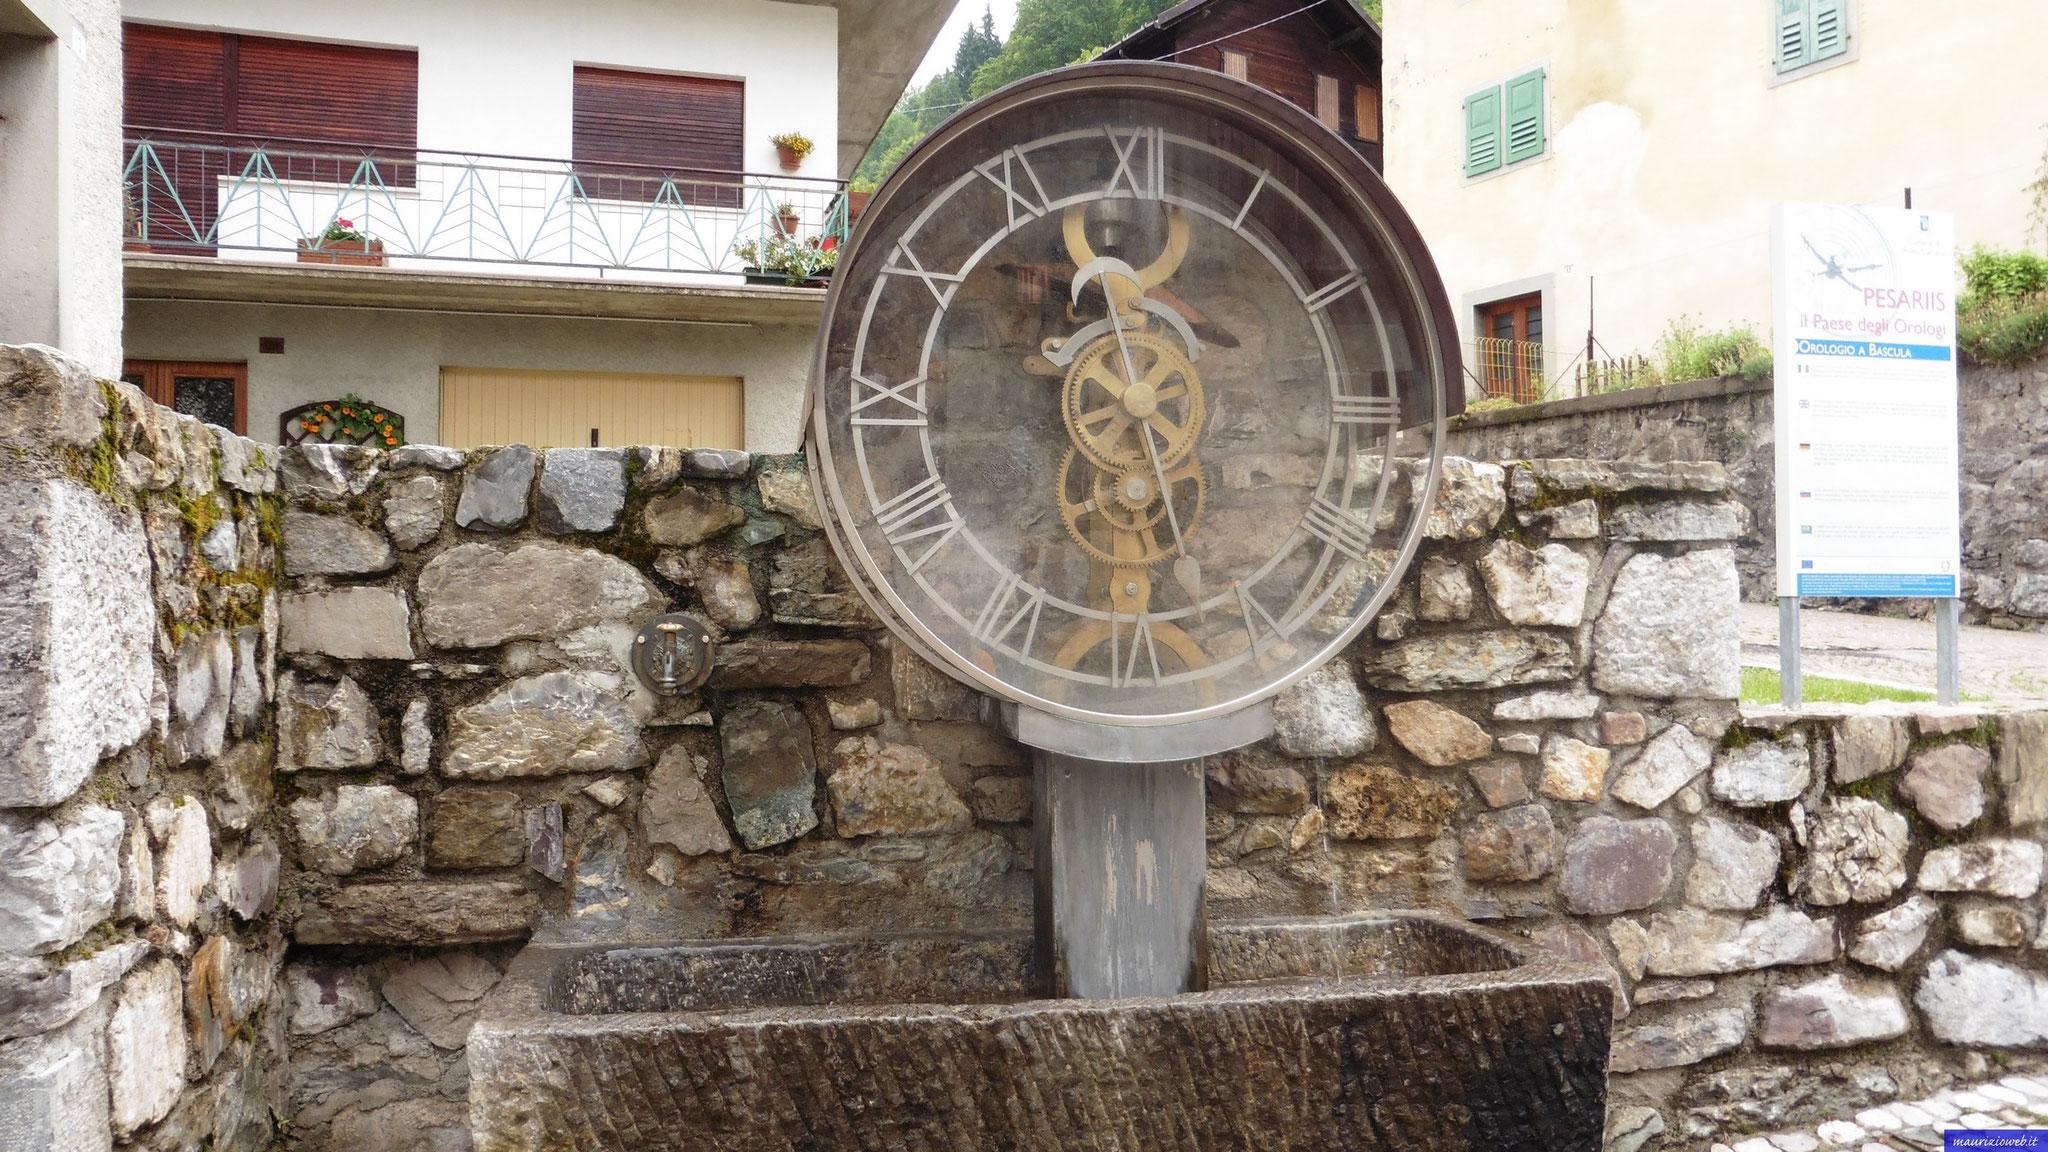 Pesariis il paese degli orologi